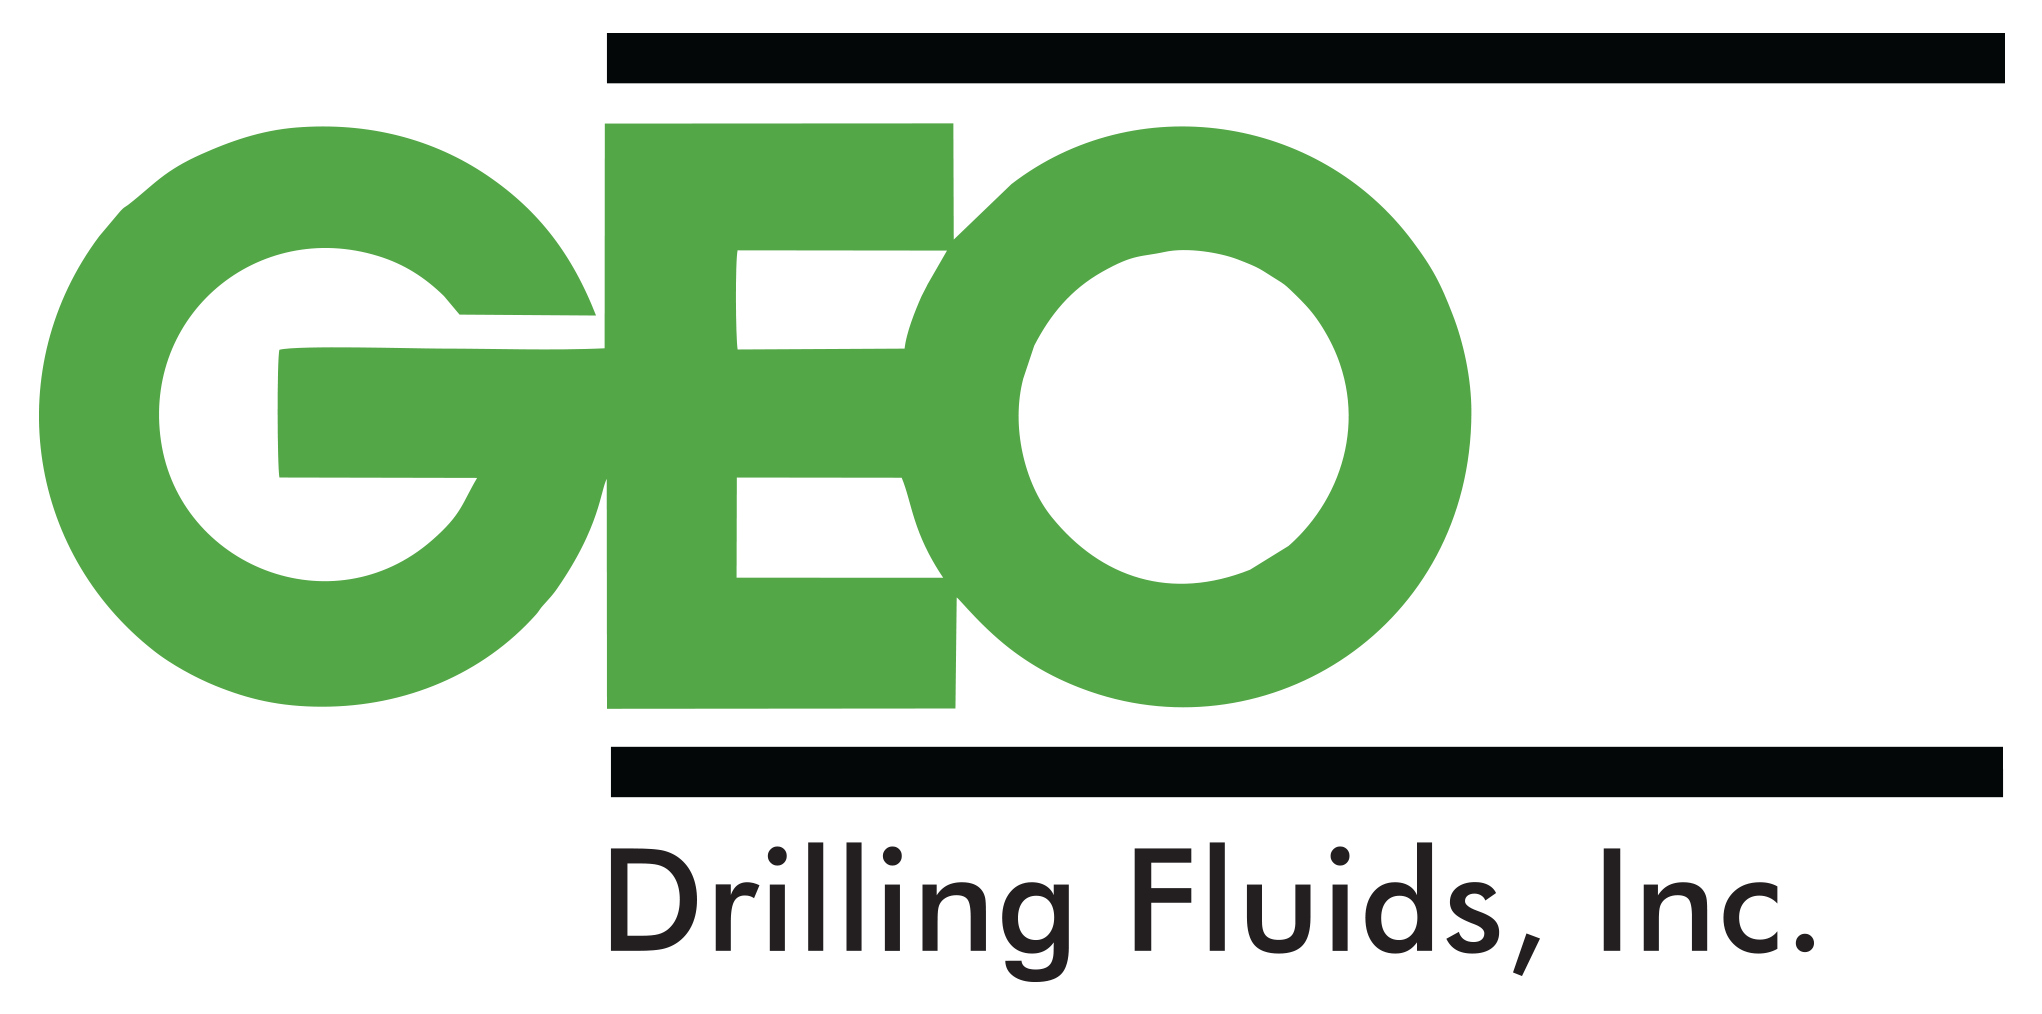 GEO Drilling Fluids, Inc.